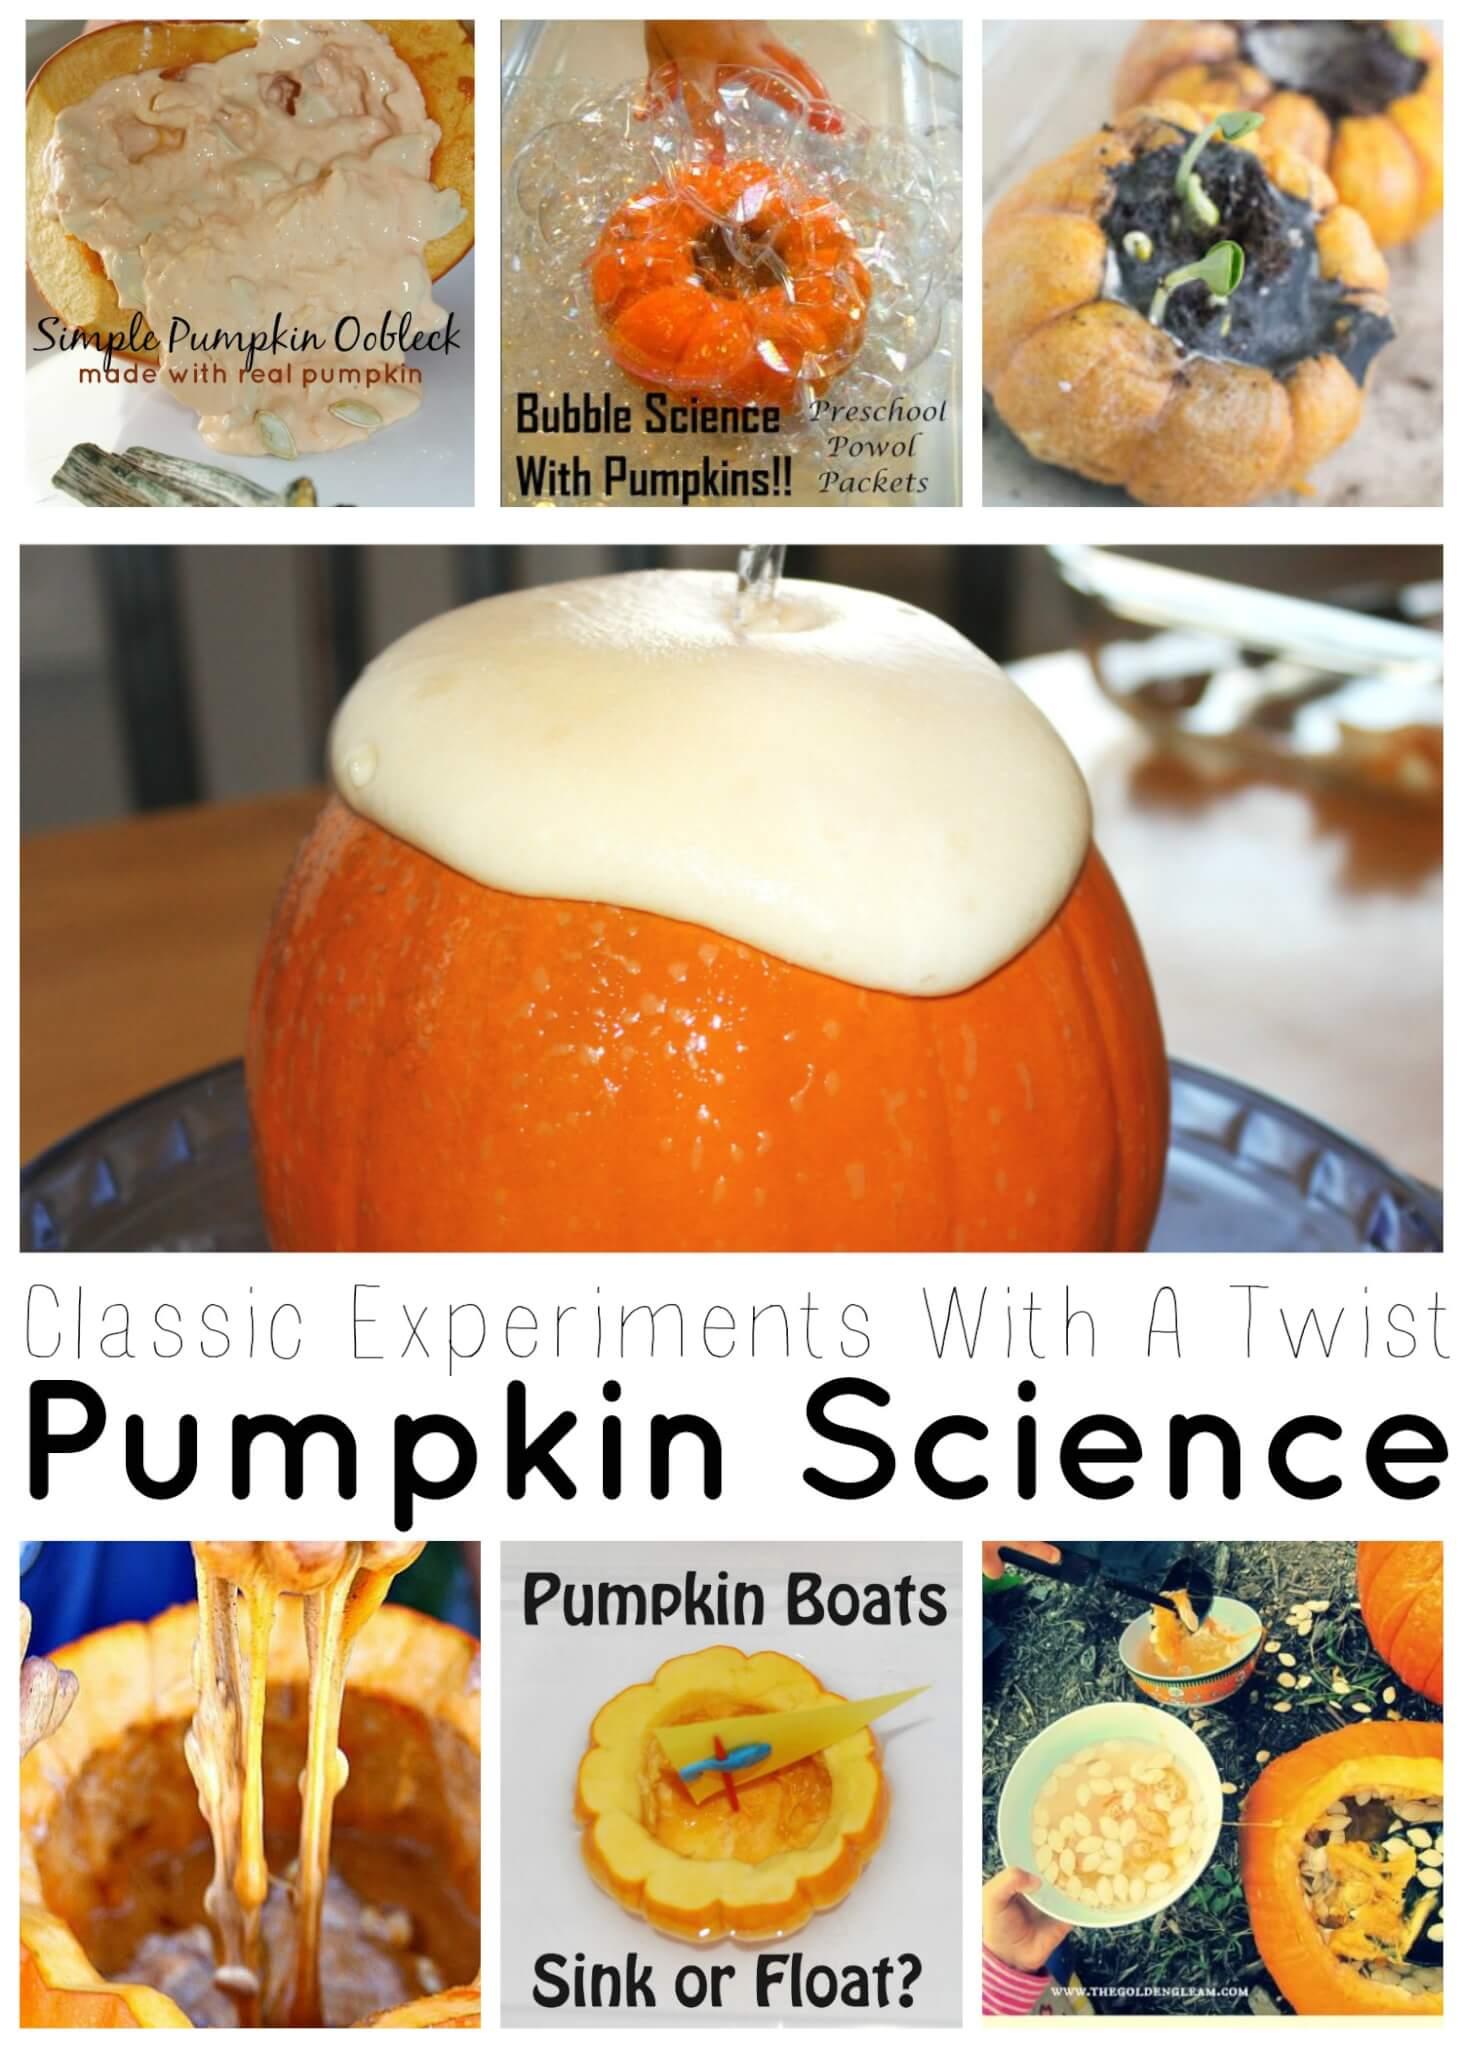 Pumpkin Science Experiments Classics With A Twist